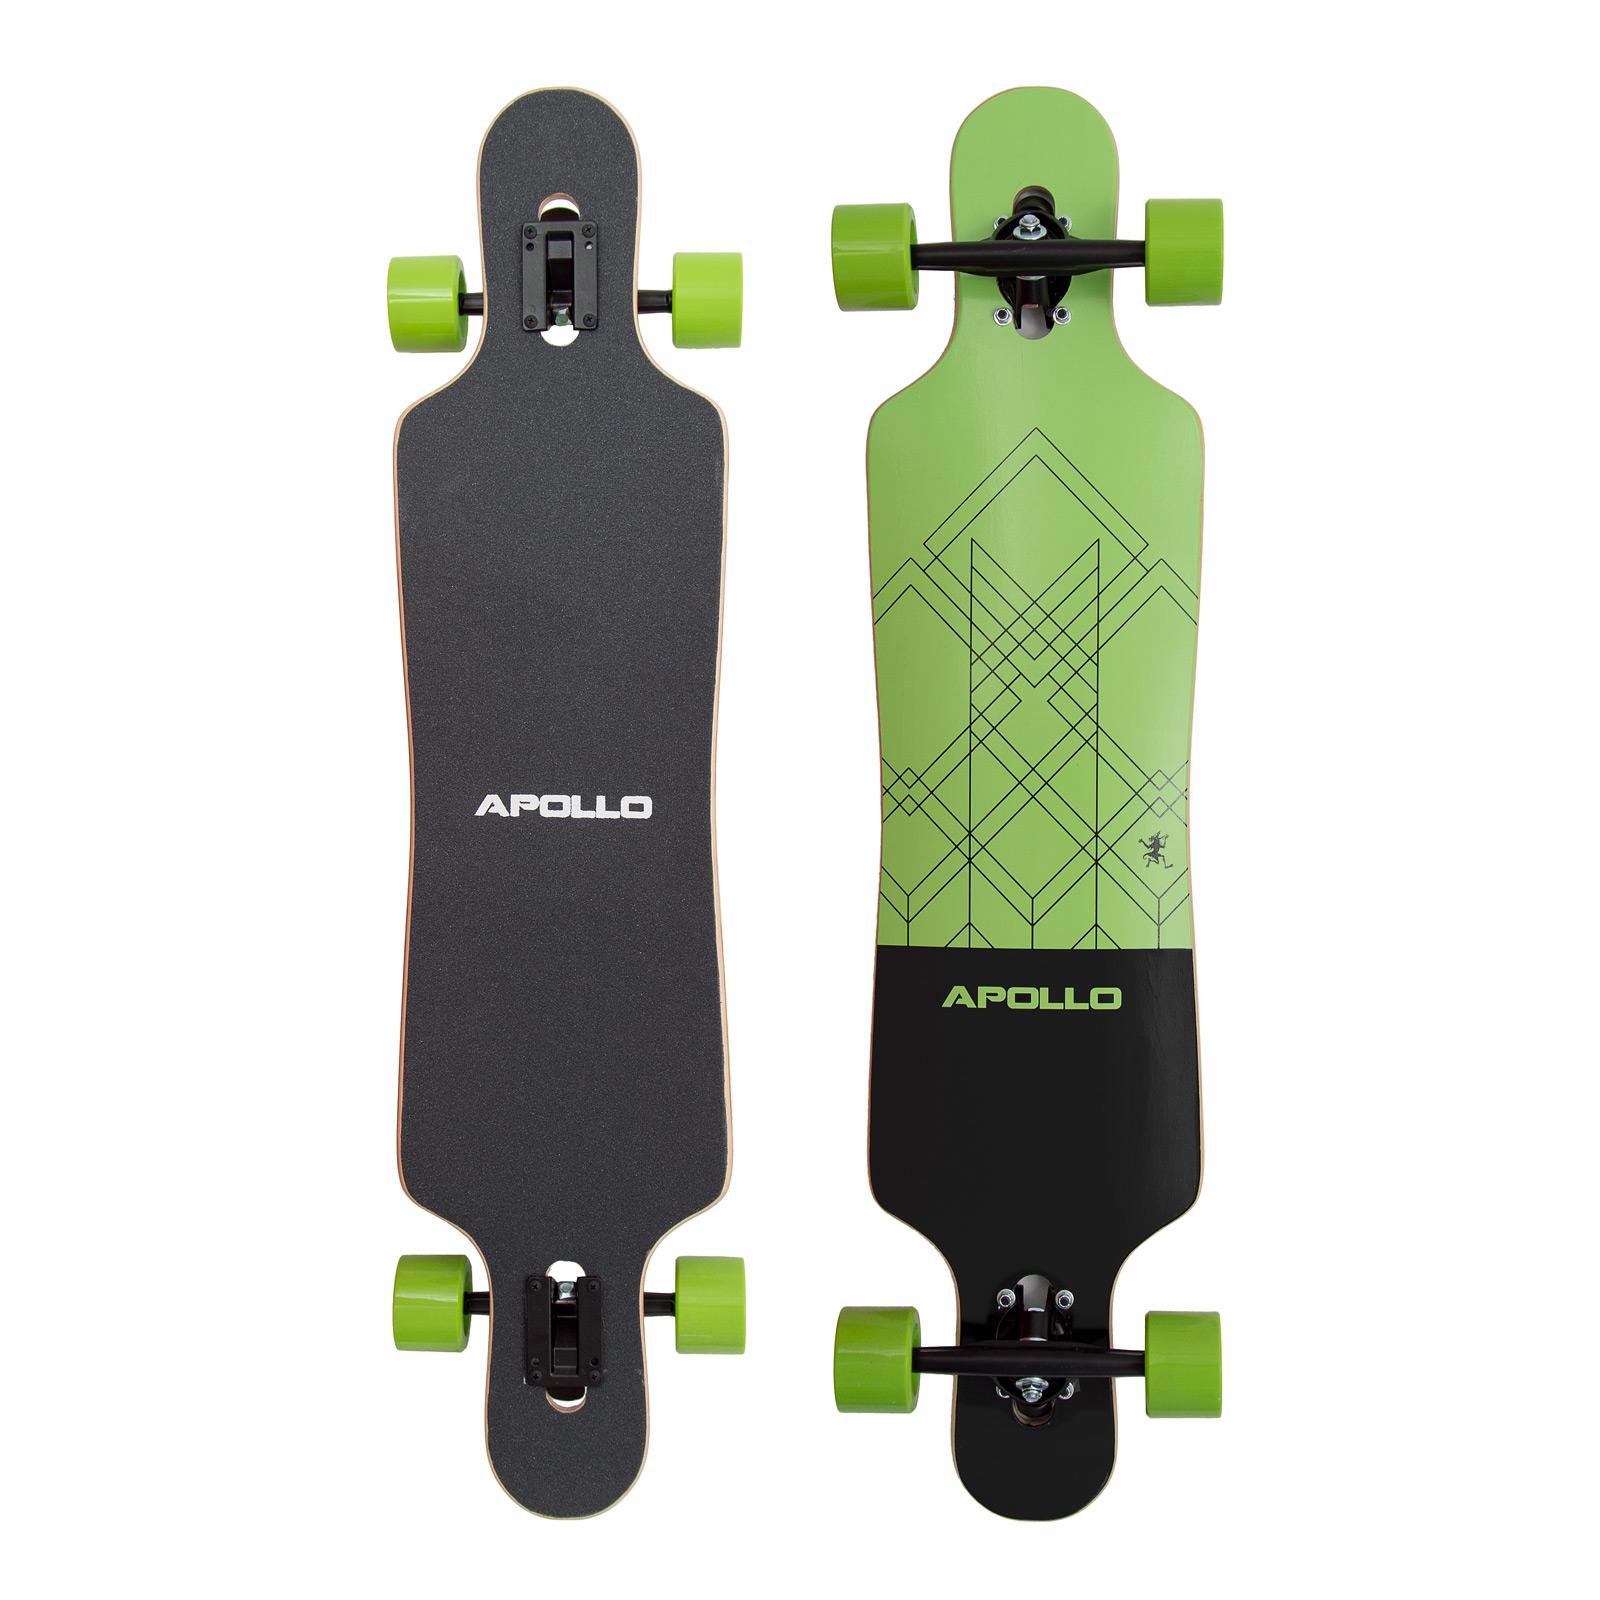 Apollo Longboard Vanua TwinTip DT Länge: 101,6cm Breite: 24,6cm